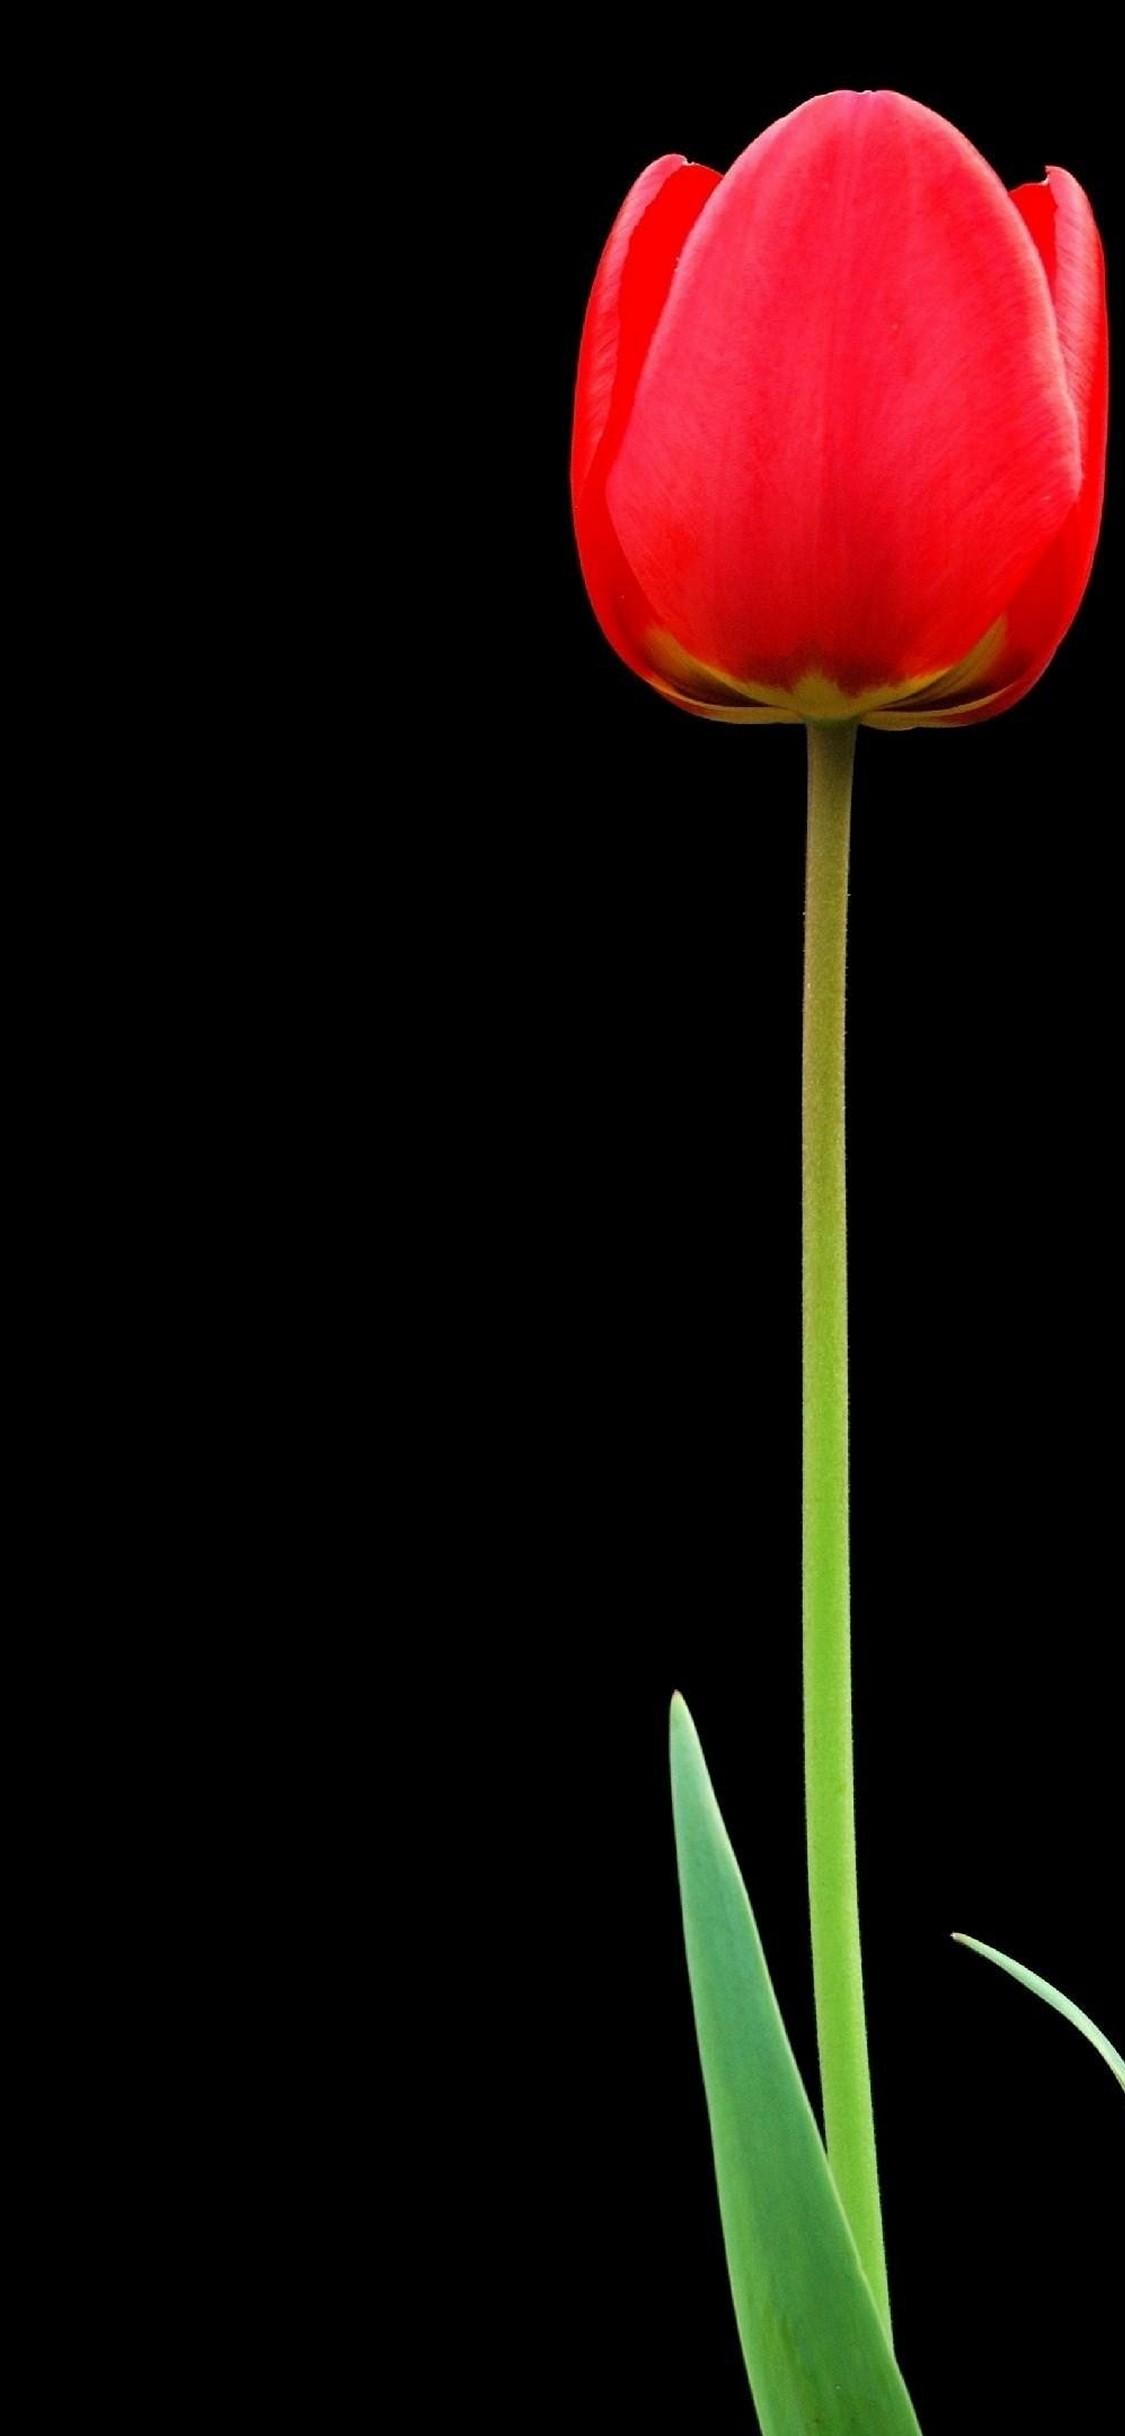 Superhero Wallpaper Iphone X Tulip Red Flower Hd Wallpaper 1125x2436